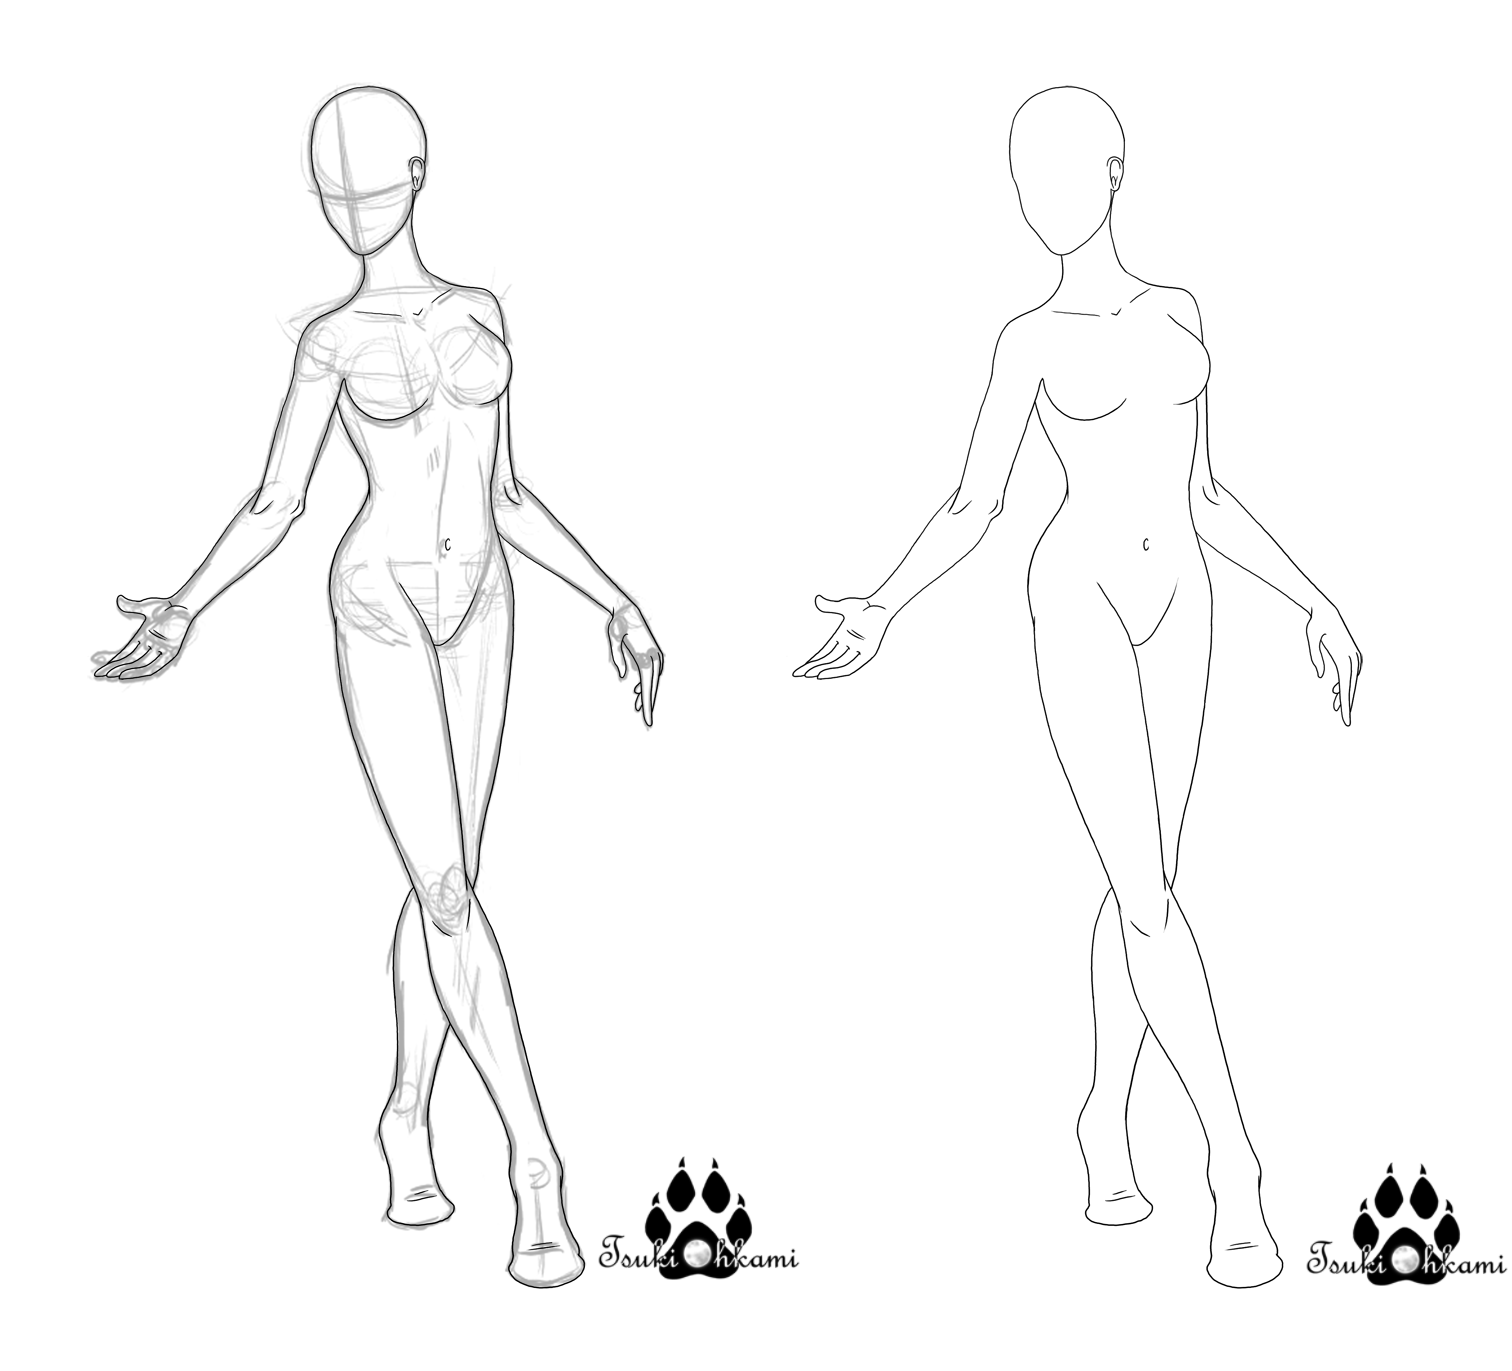 Female Base Pose Doublet Read Description By Tsukiohkami Http Www Deviantart Com Order 5 Q Female Base Lineart Female Base Drawing Base Furry Art